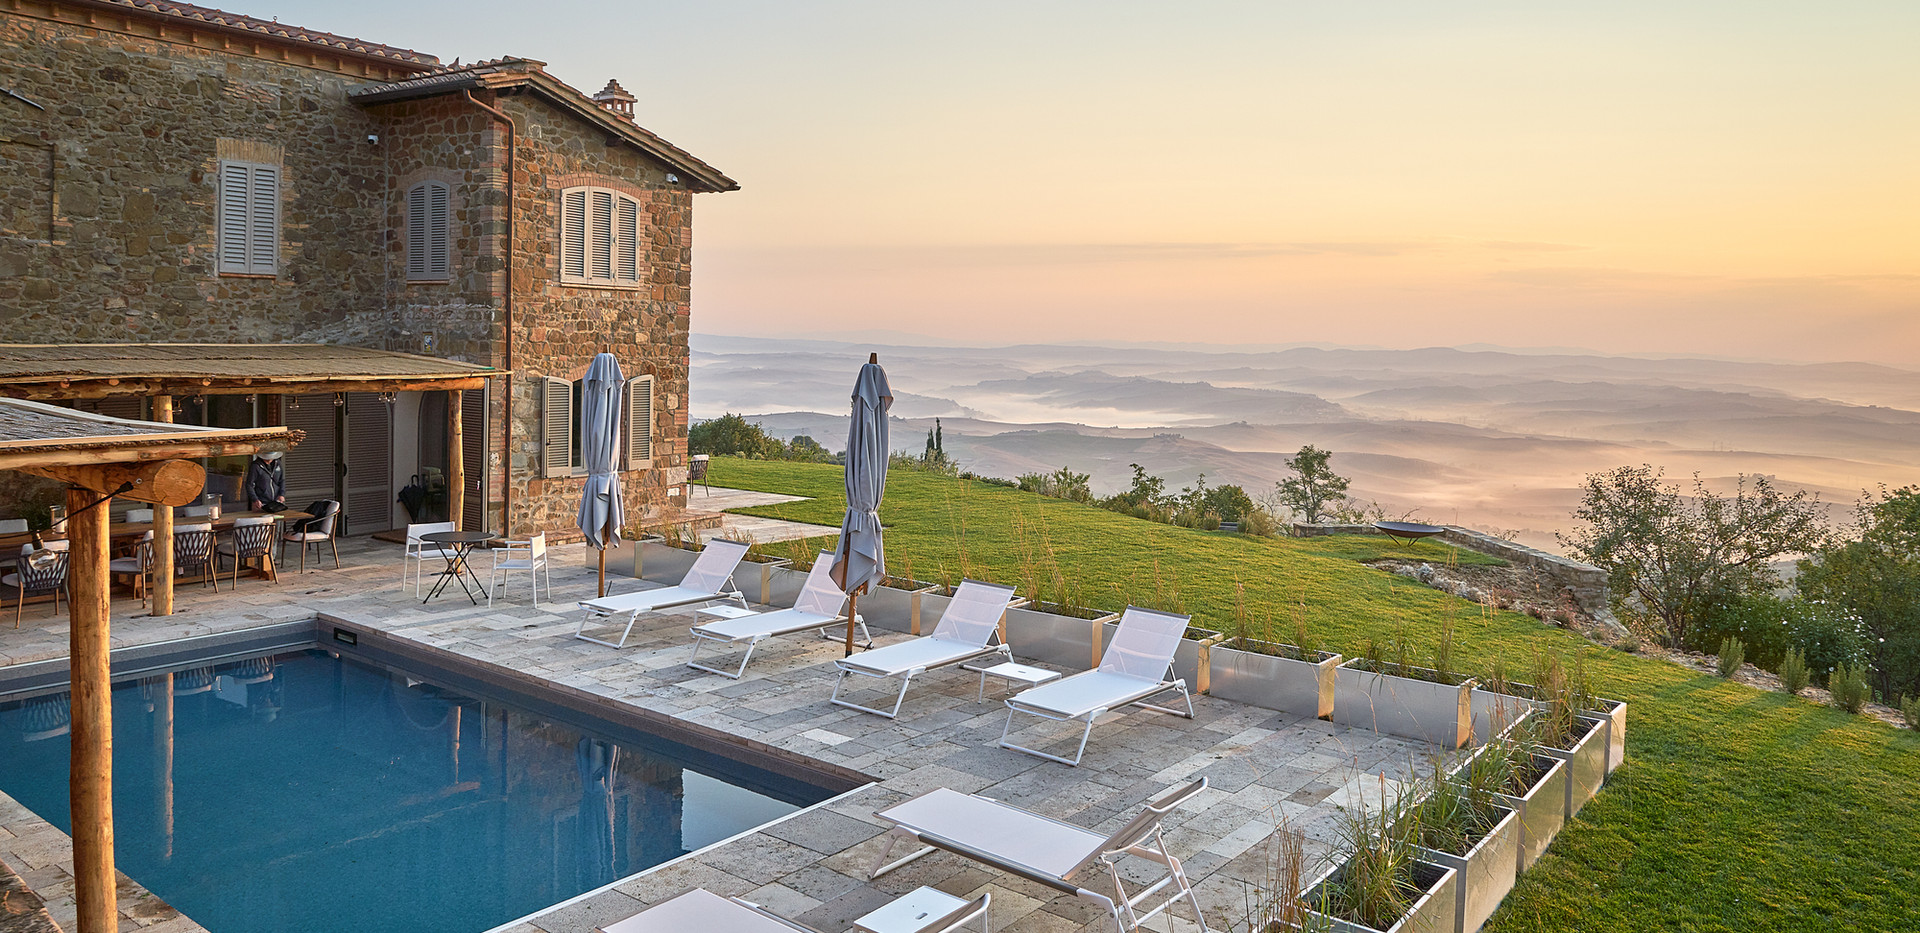 Villa Palazzetta-Aug 2018-0227.jpg